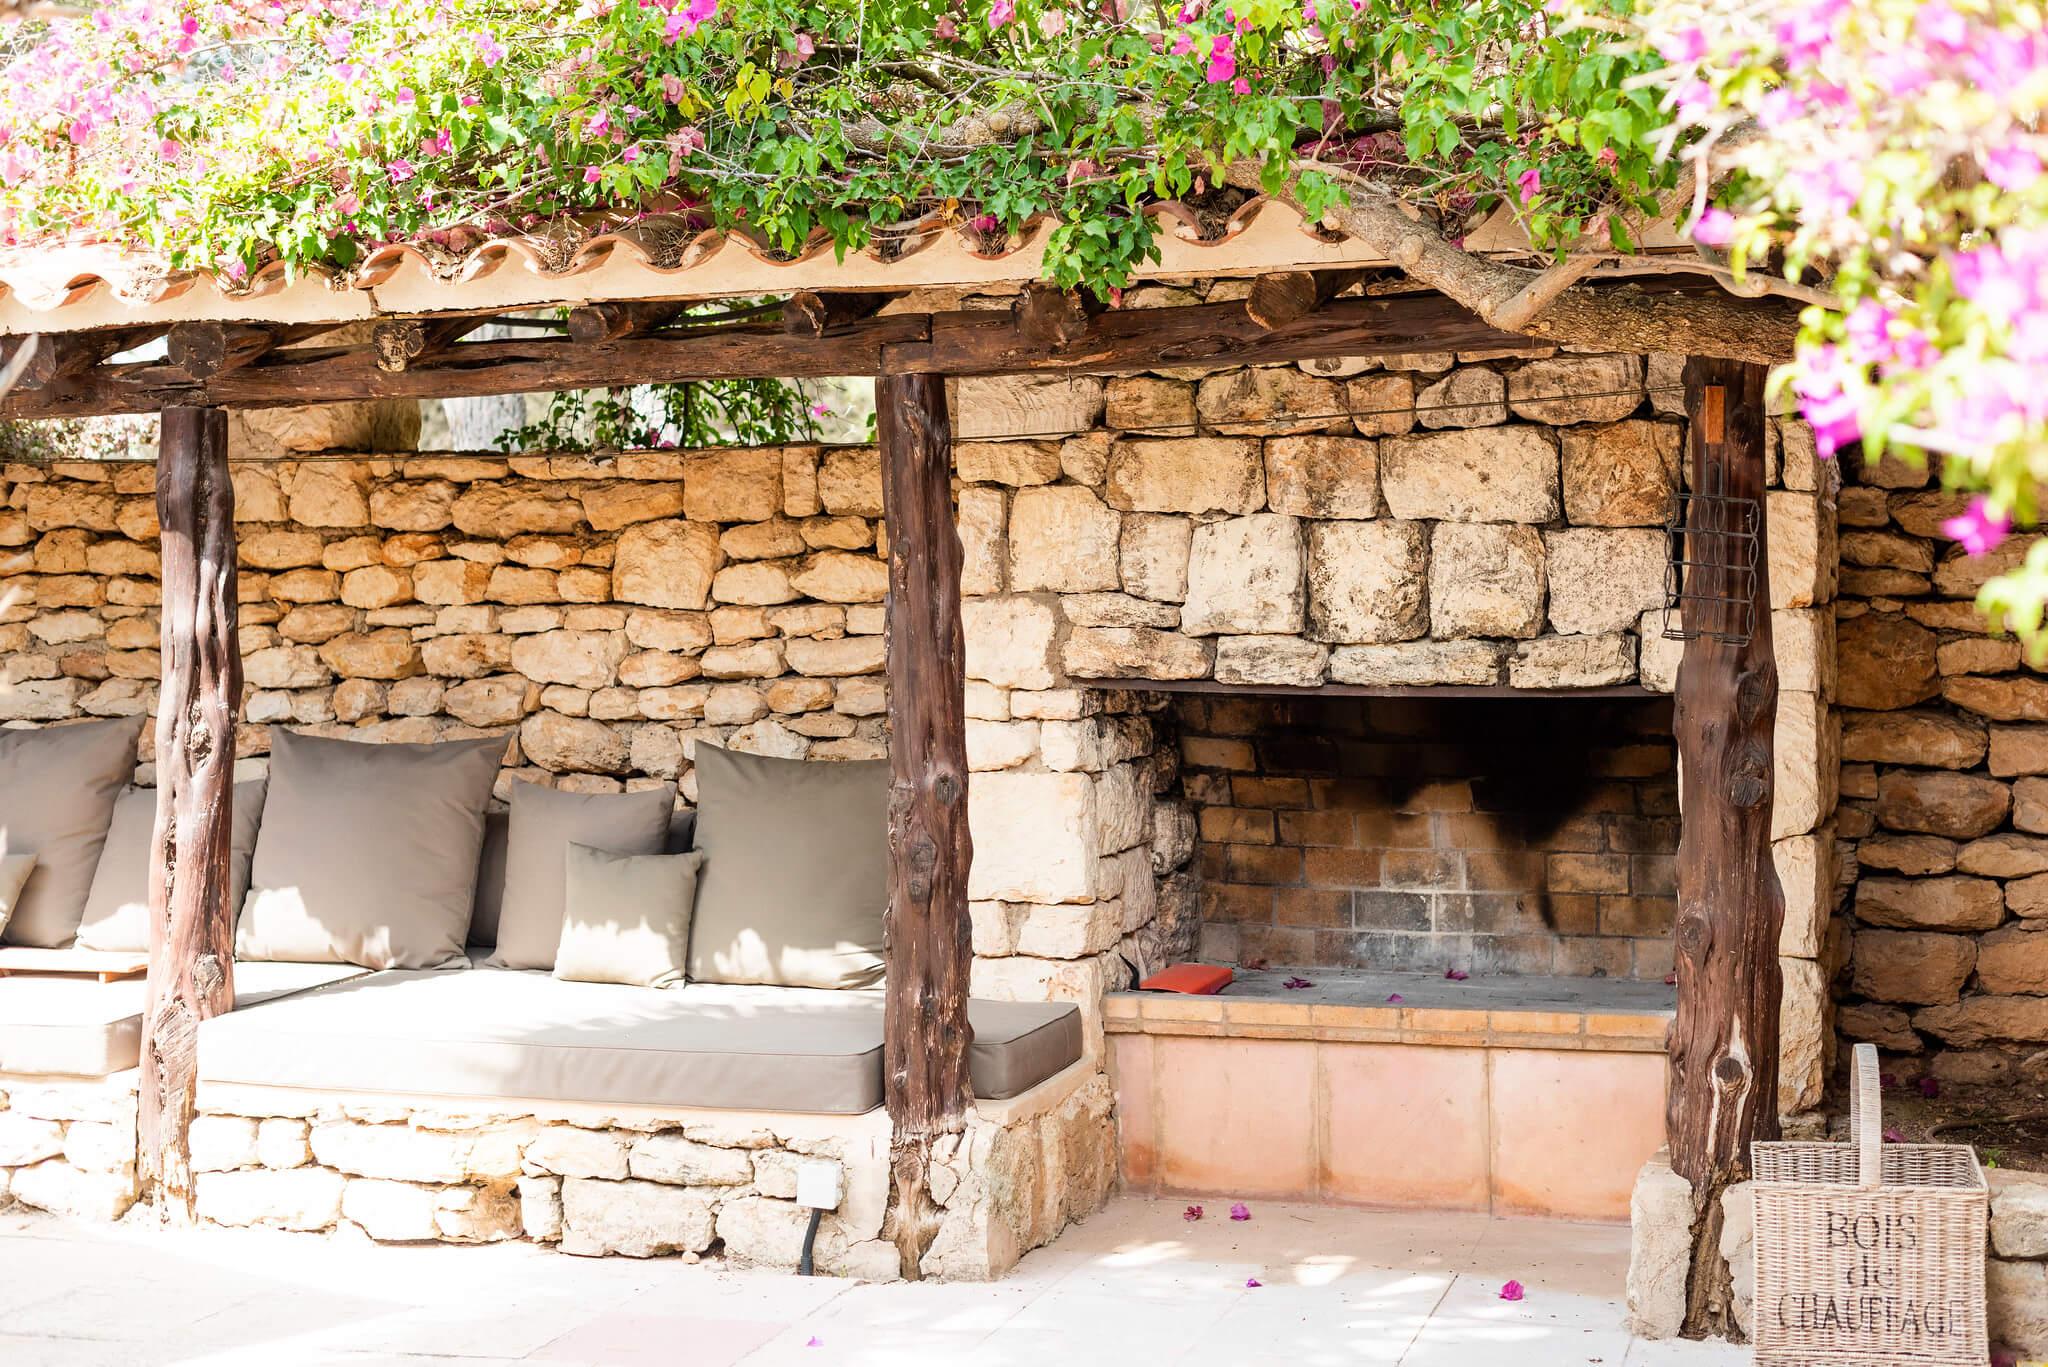 https://www.white-ibiza.com/wp-content/uploads/2020/05/white-ibiza-villas-can-riviere-exterior-lounge-terrace.jpg